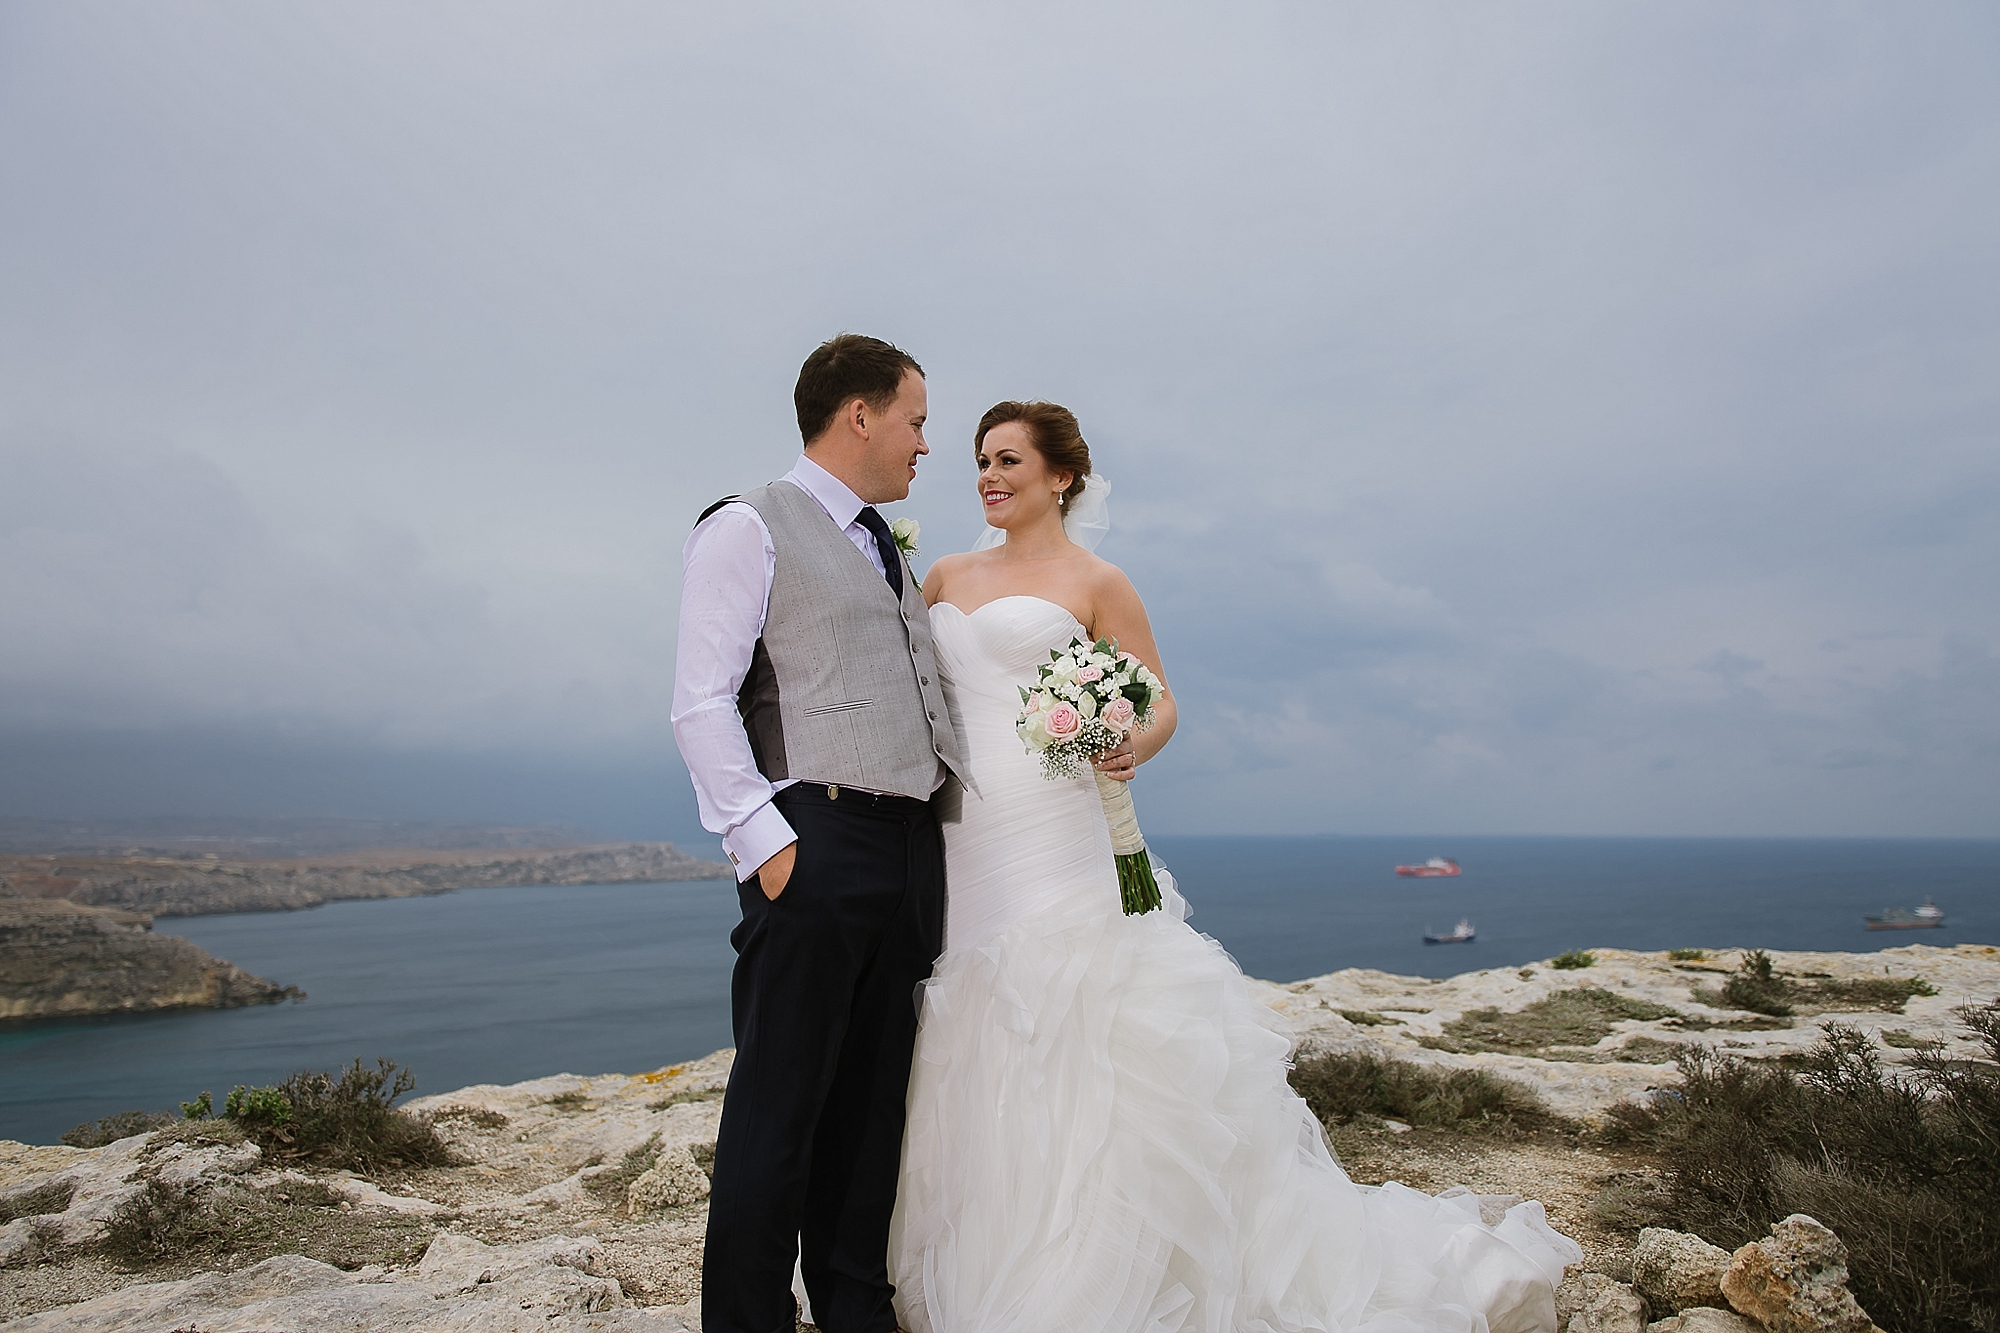 Joanne + David | Radisson Blu Golden Sands — Malta Wedding ...